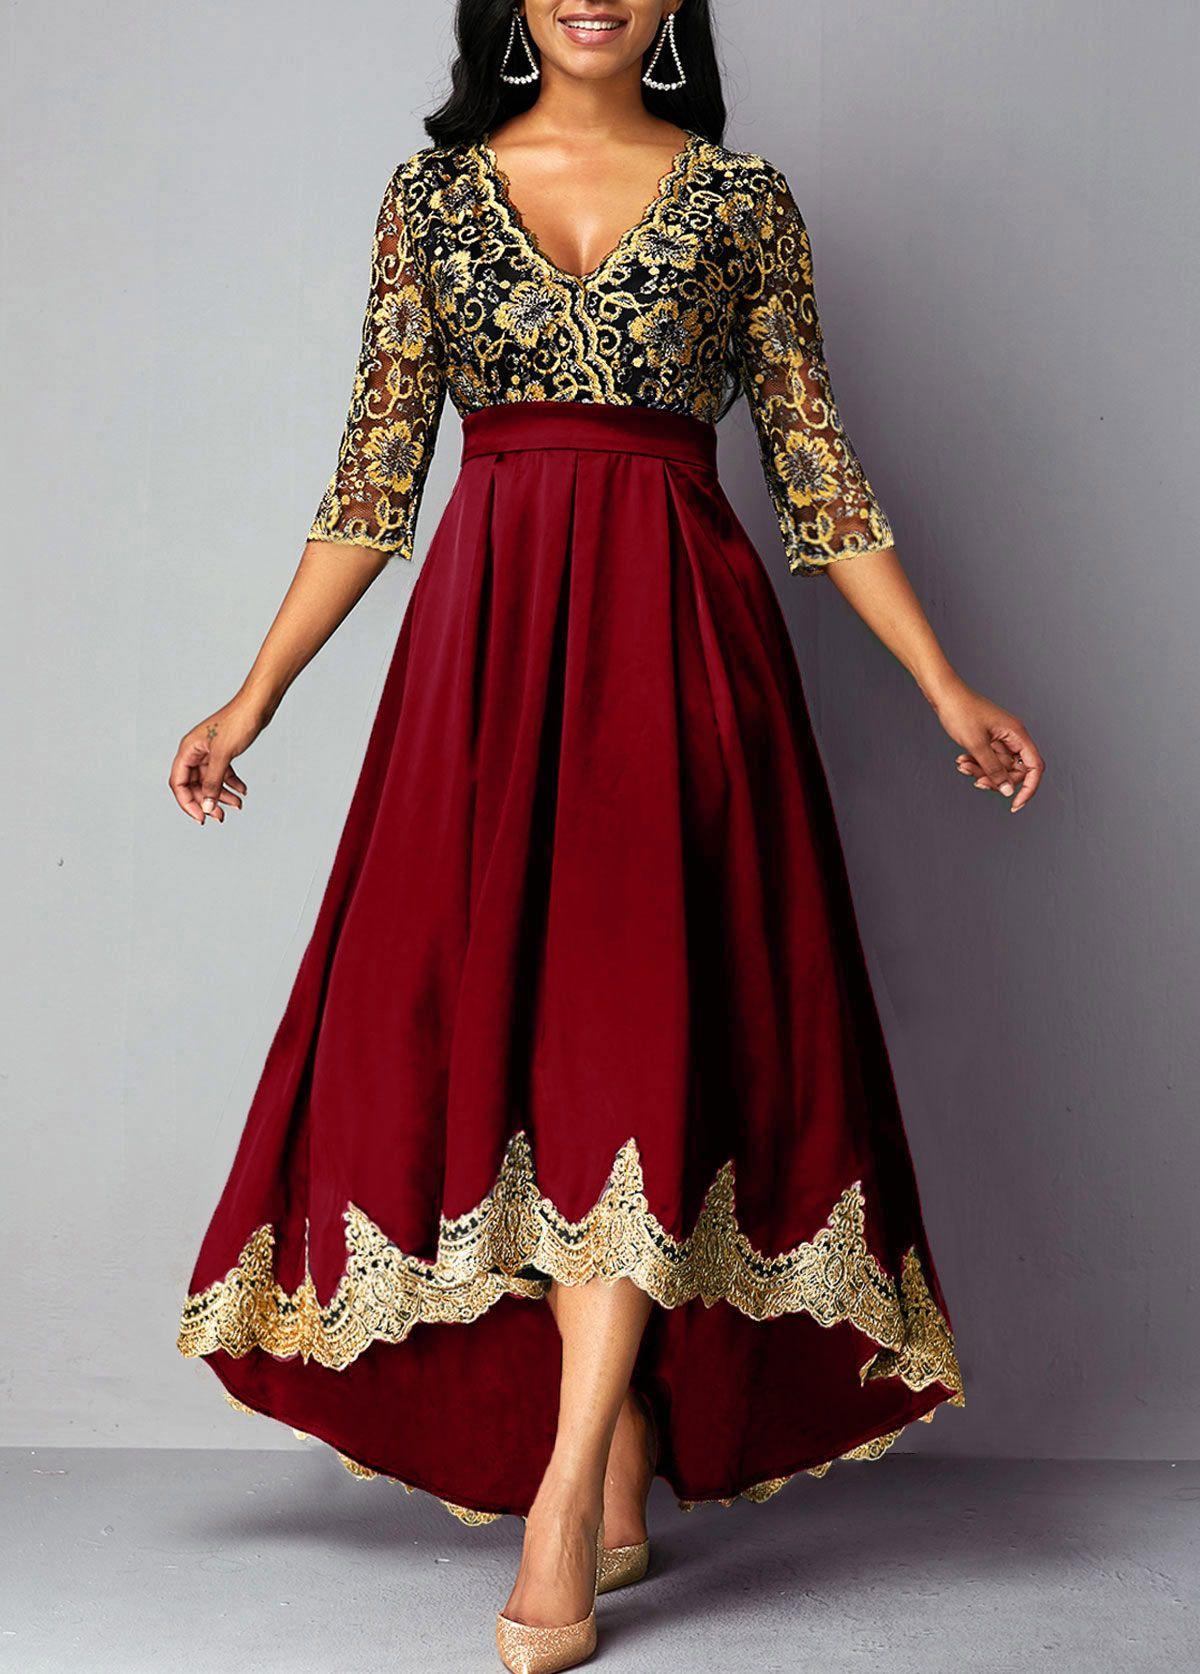 Lace Patchwork Three Quarter Sleeve High Low Dress Rosewe Com Usd 41 87 Lace Panel Dress High Waist Dress Three Quarter Sleeve Dresses [ 1674 x 1200 Pixel ]